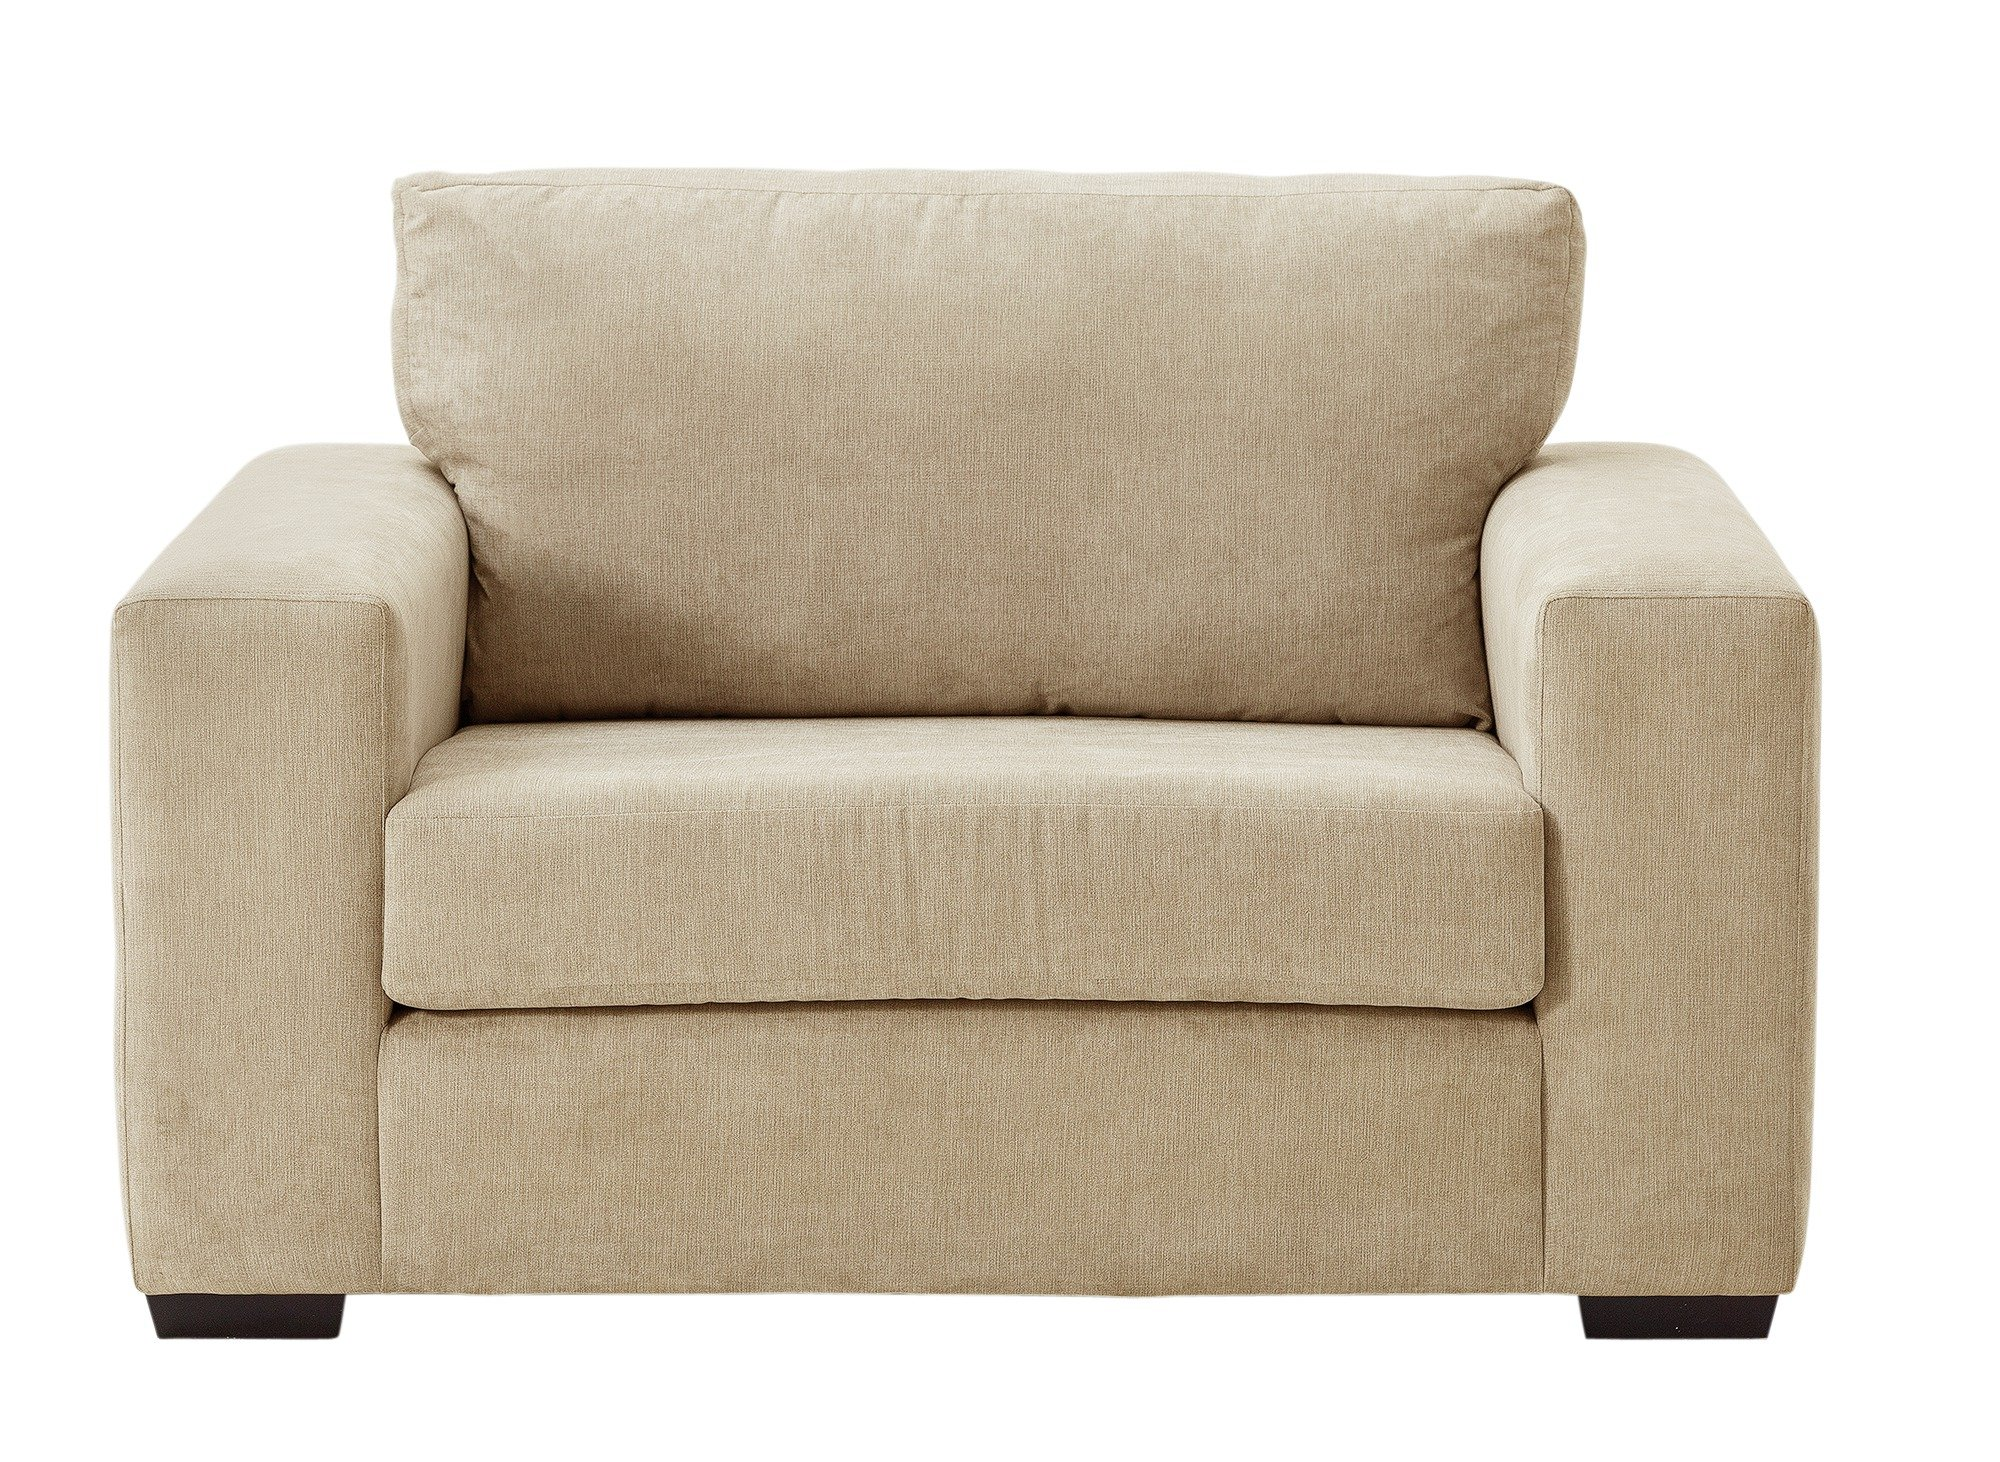 Heart of House Eton Fabric Cuddle Chair - Mink